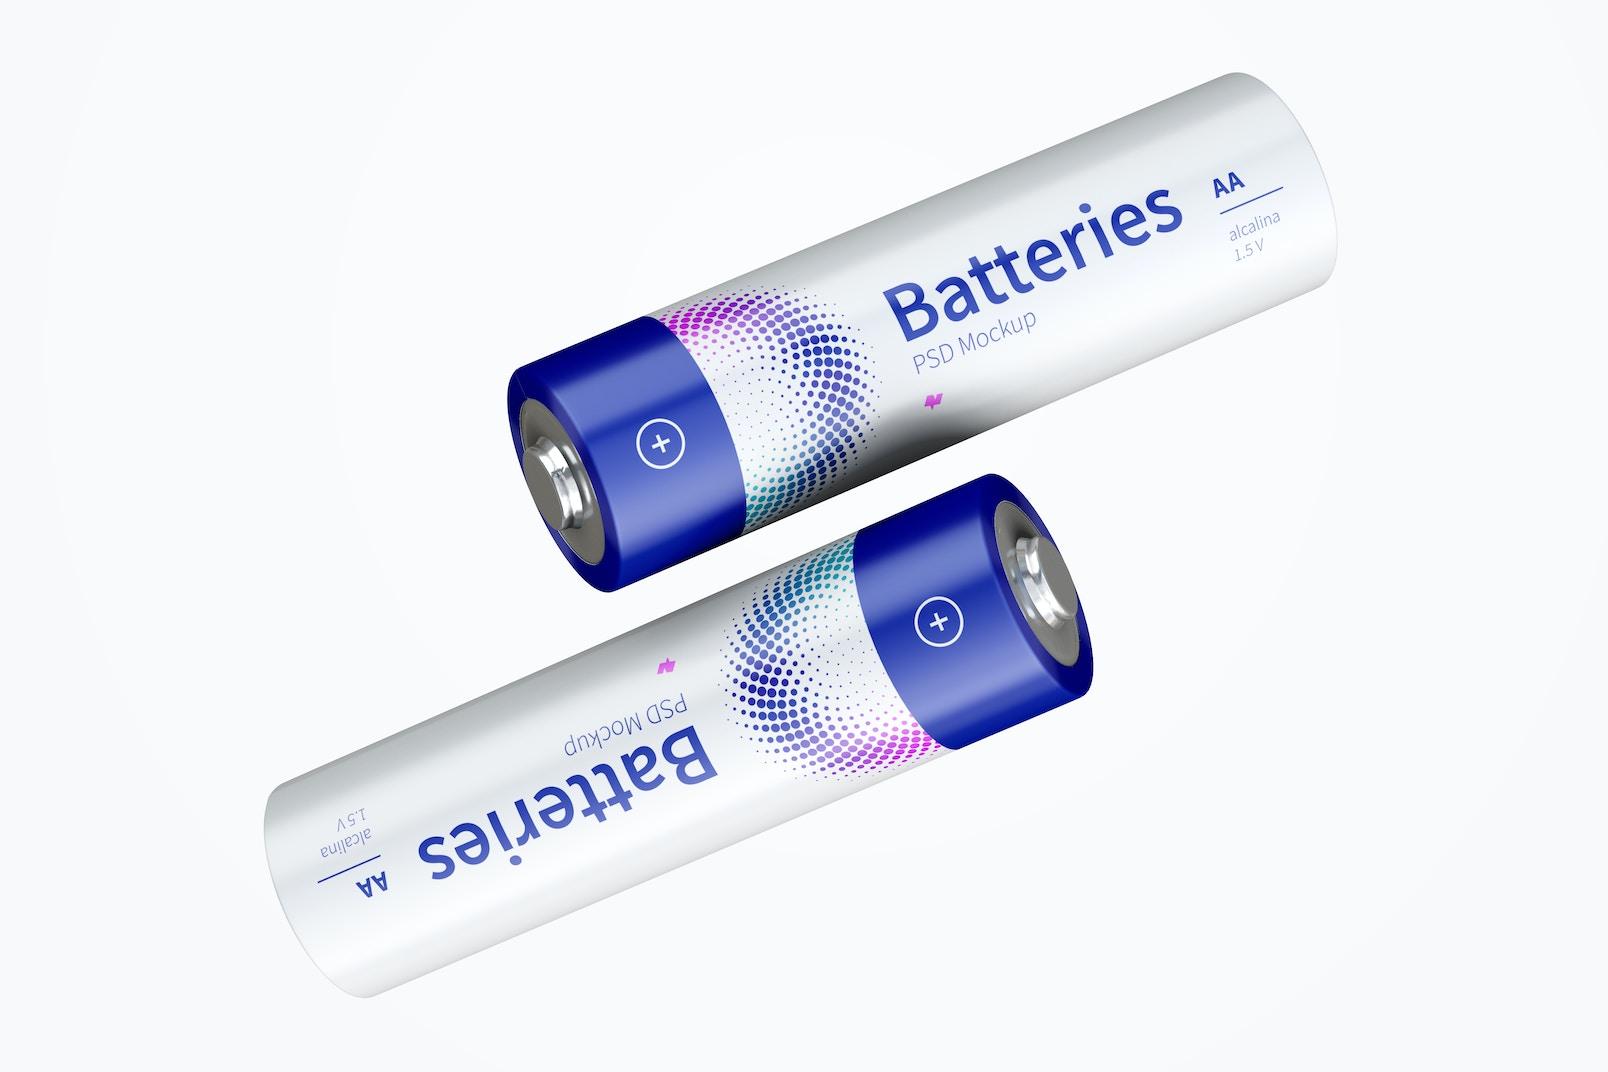 Two AA Batteries Mockup, Floating